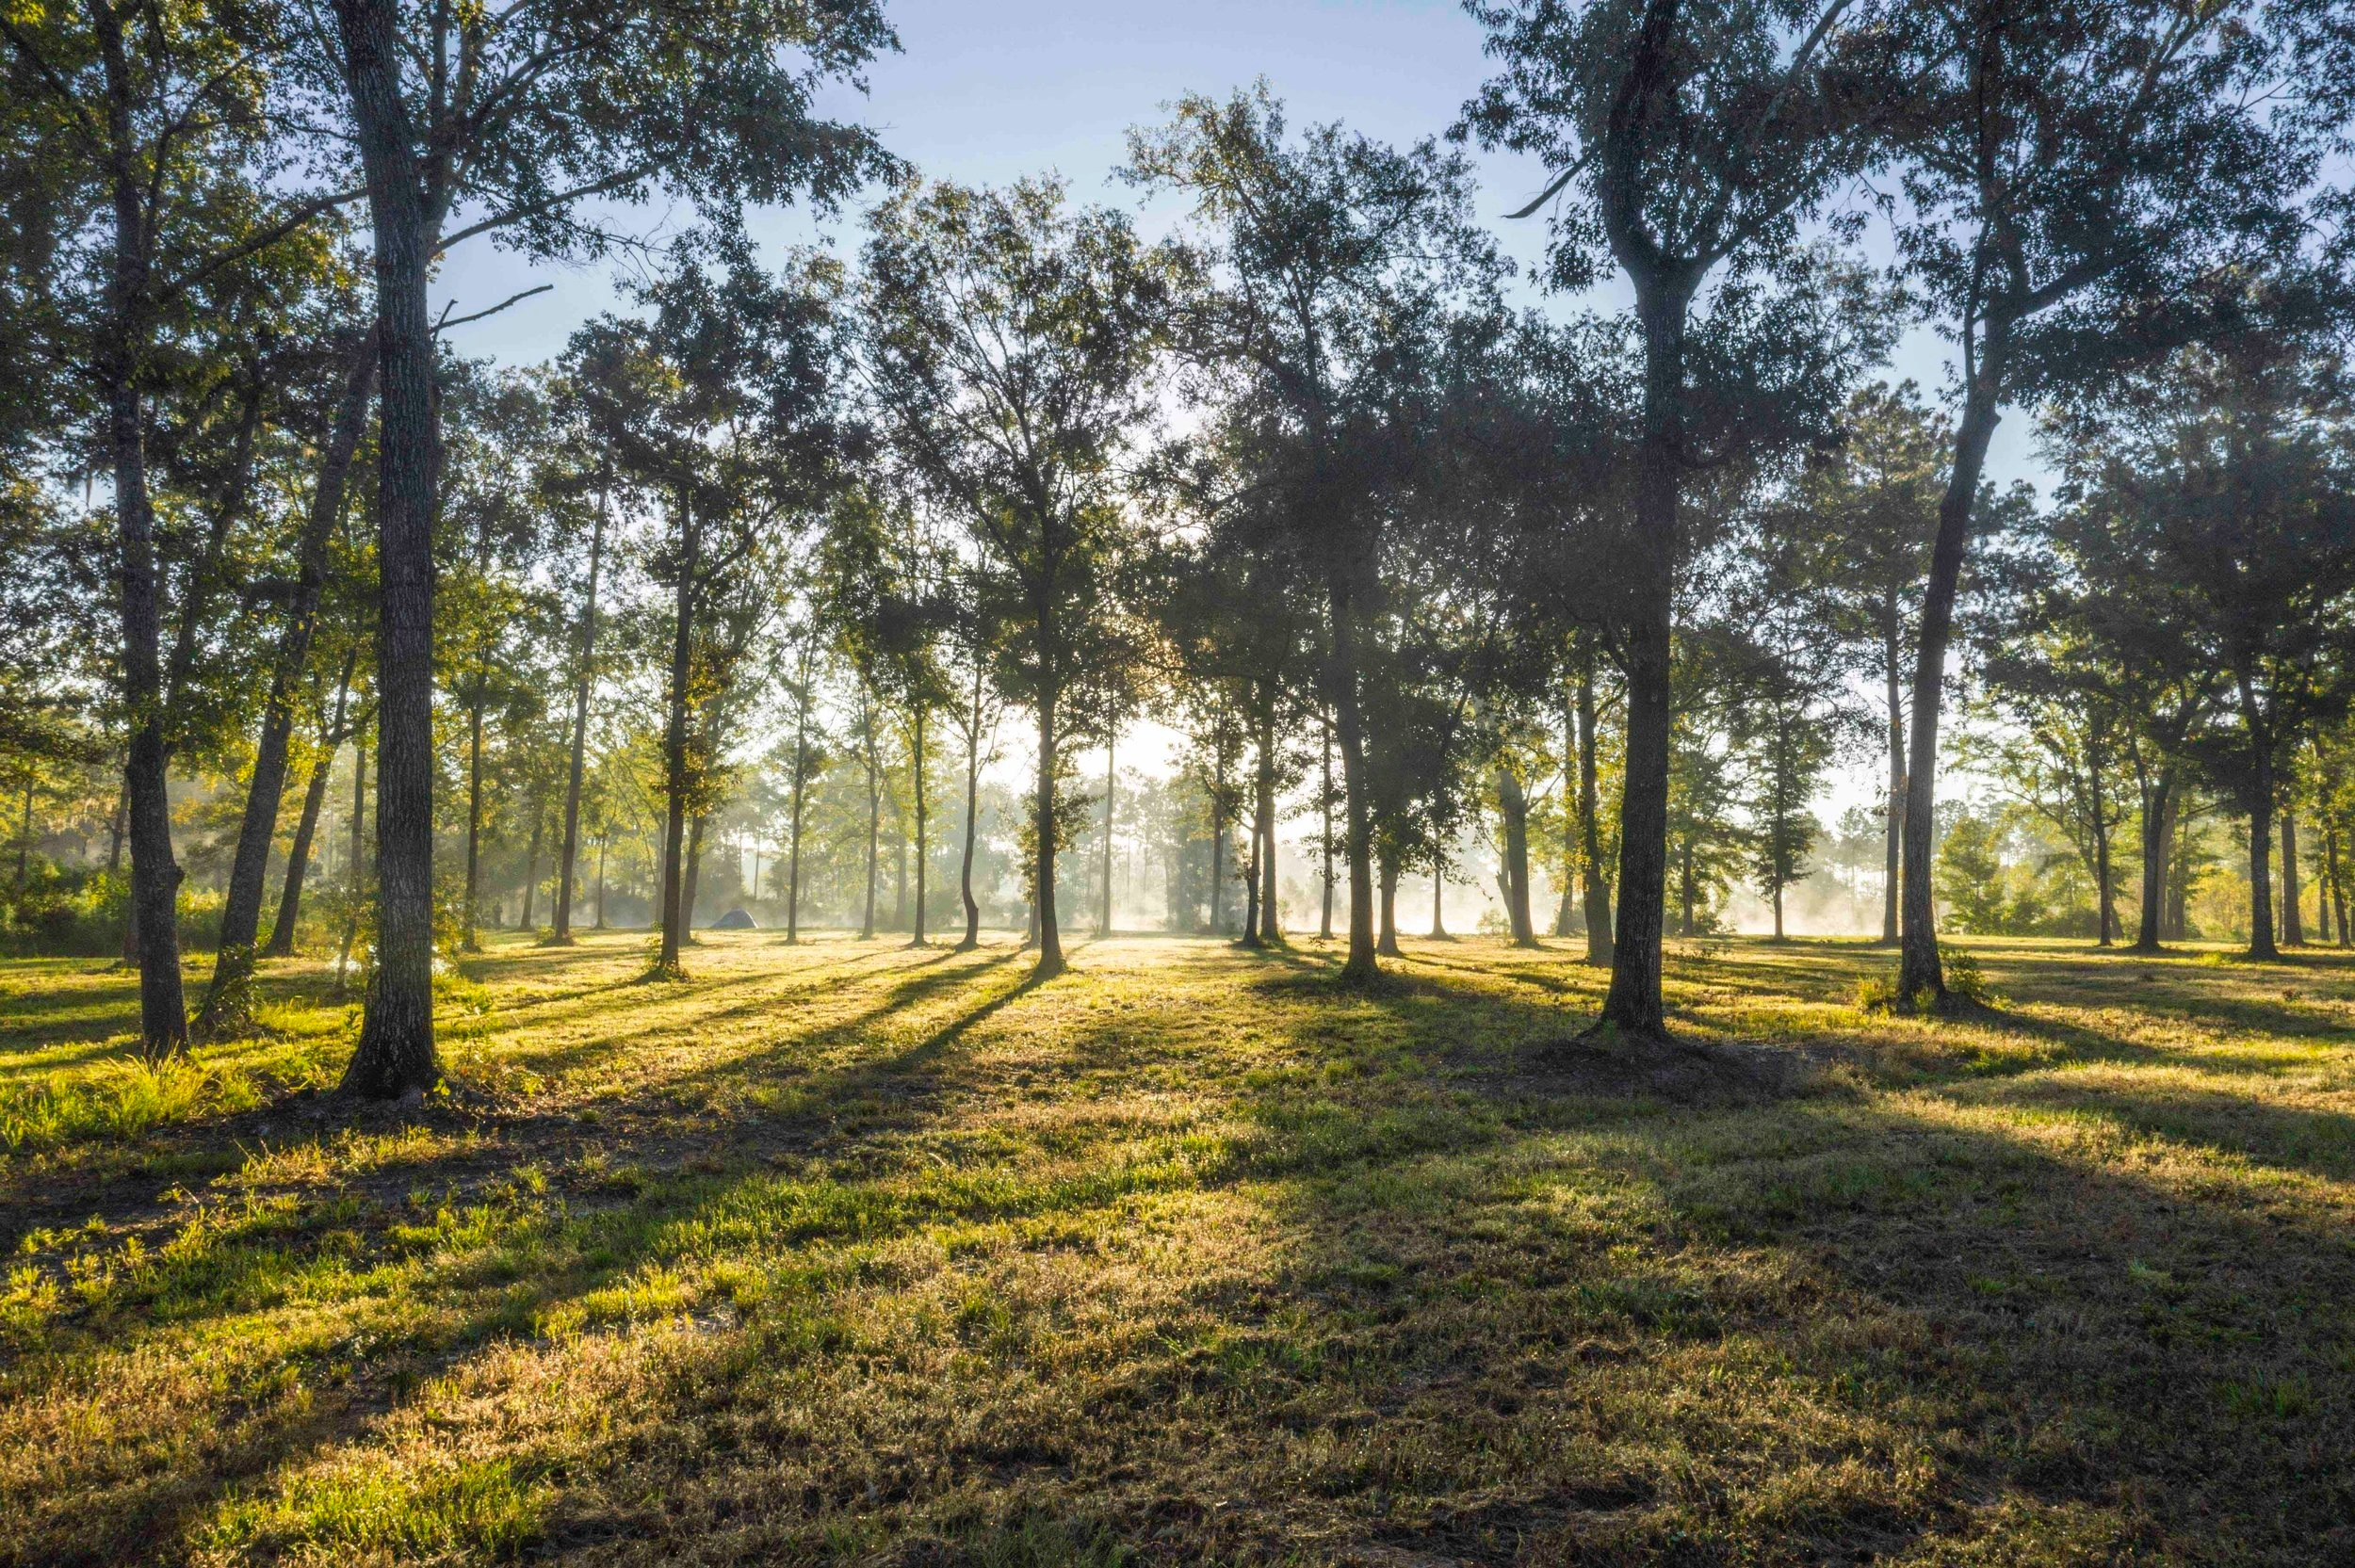 Fox Den Forest